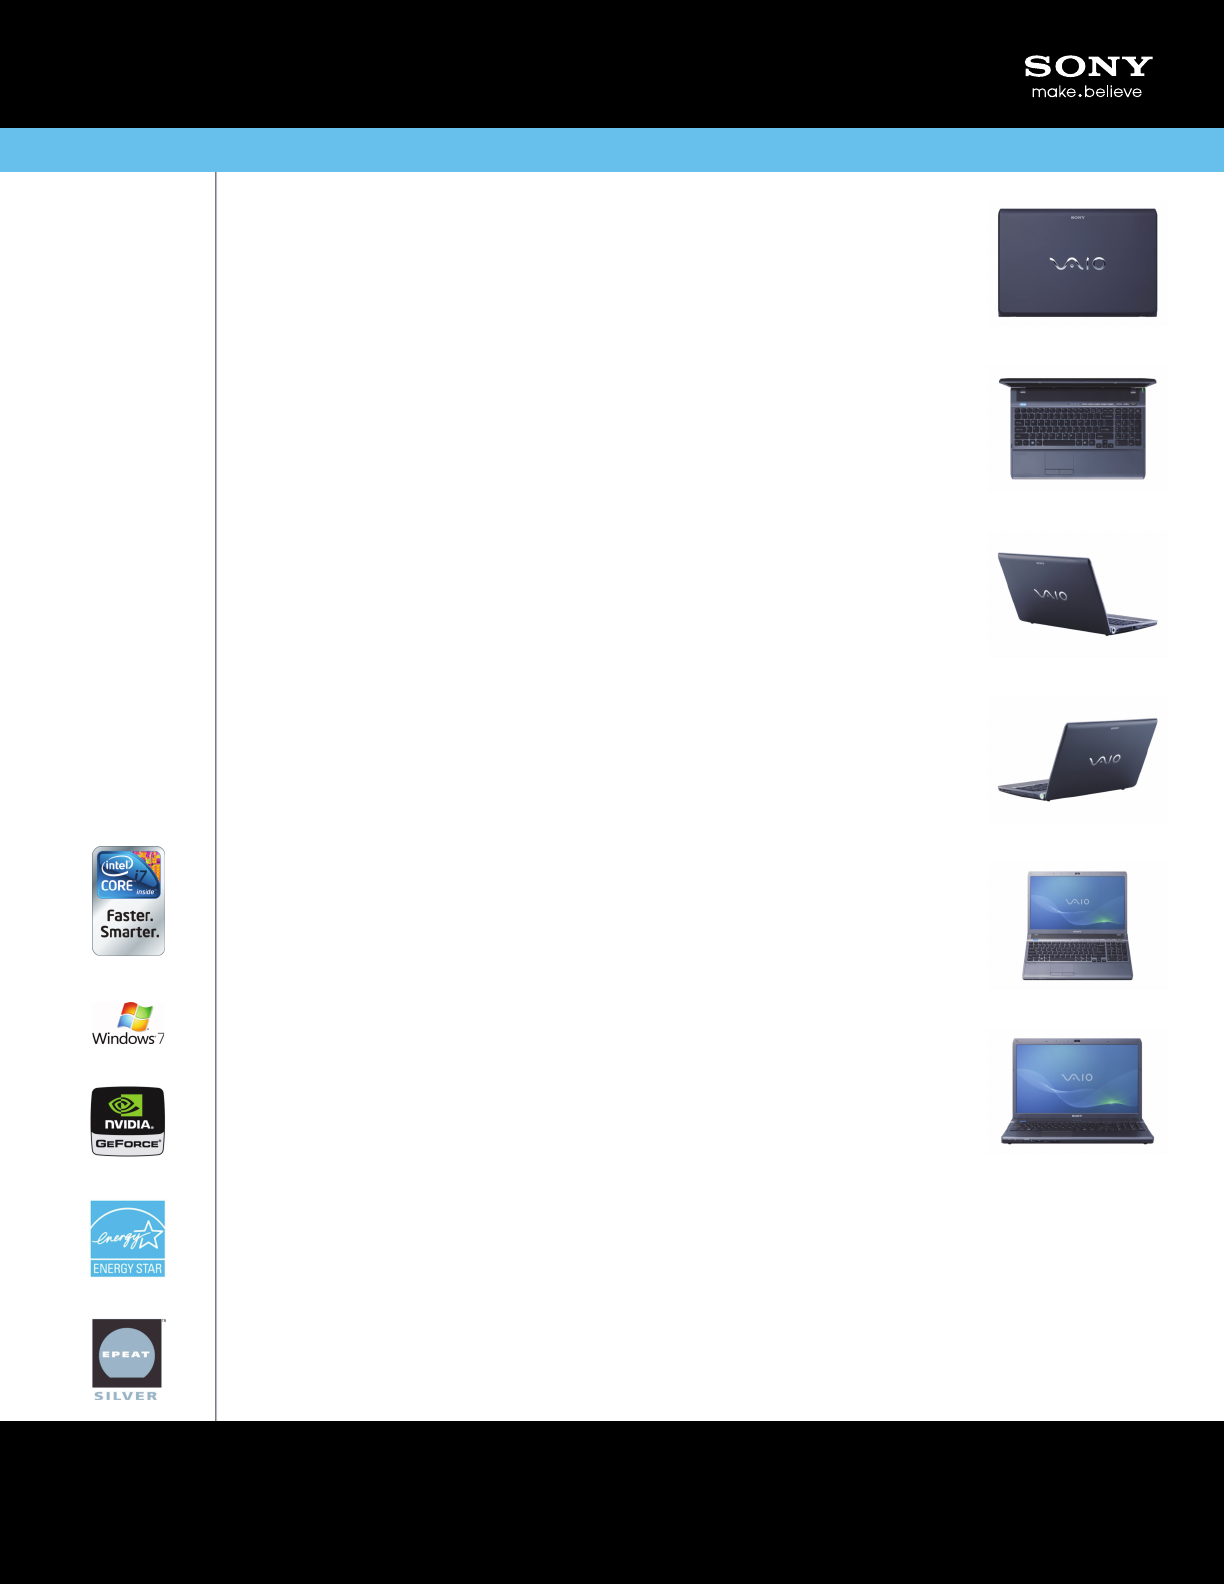 SONY VAIO VPCF13XFXB SMART NETWORK DRIVER WINDOWS XP